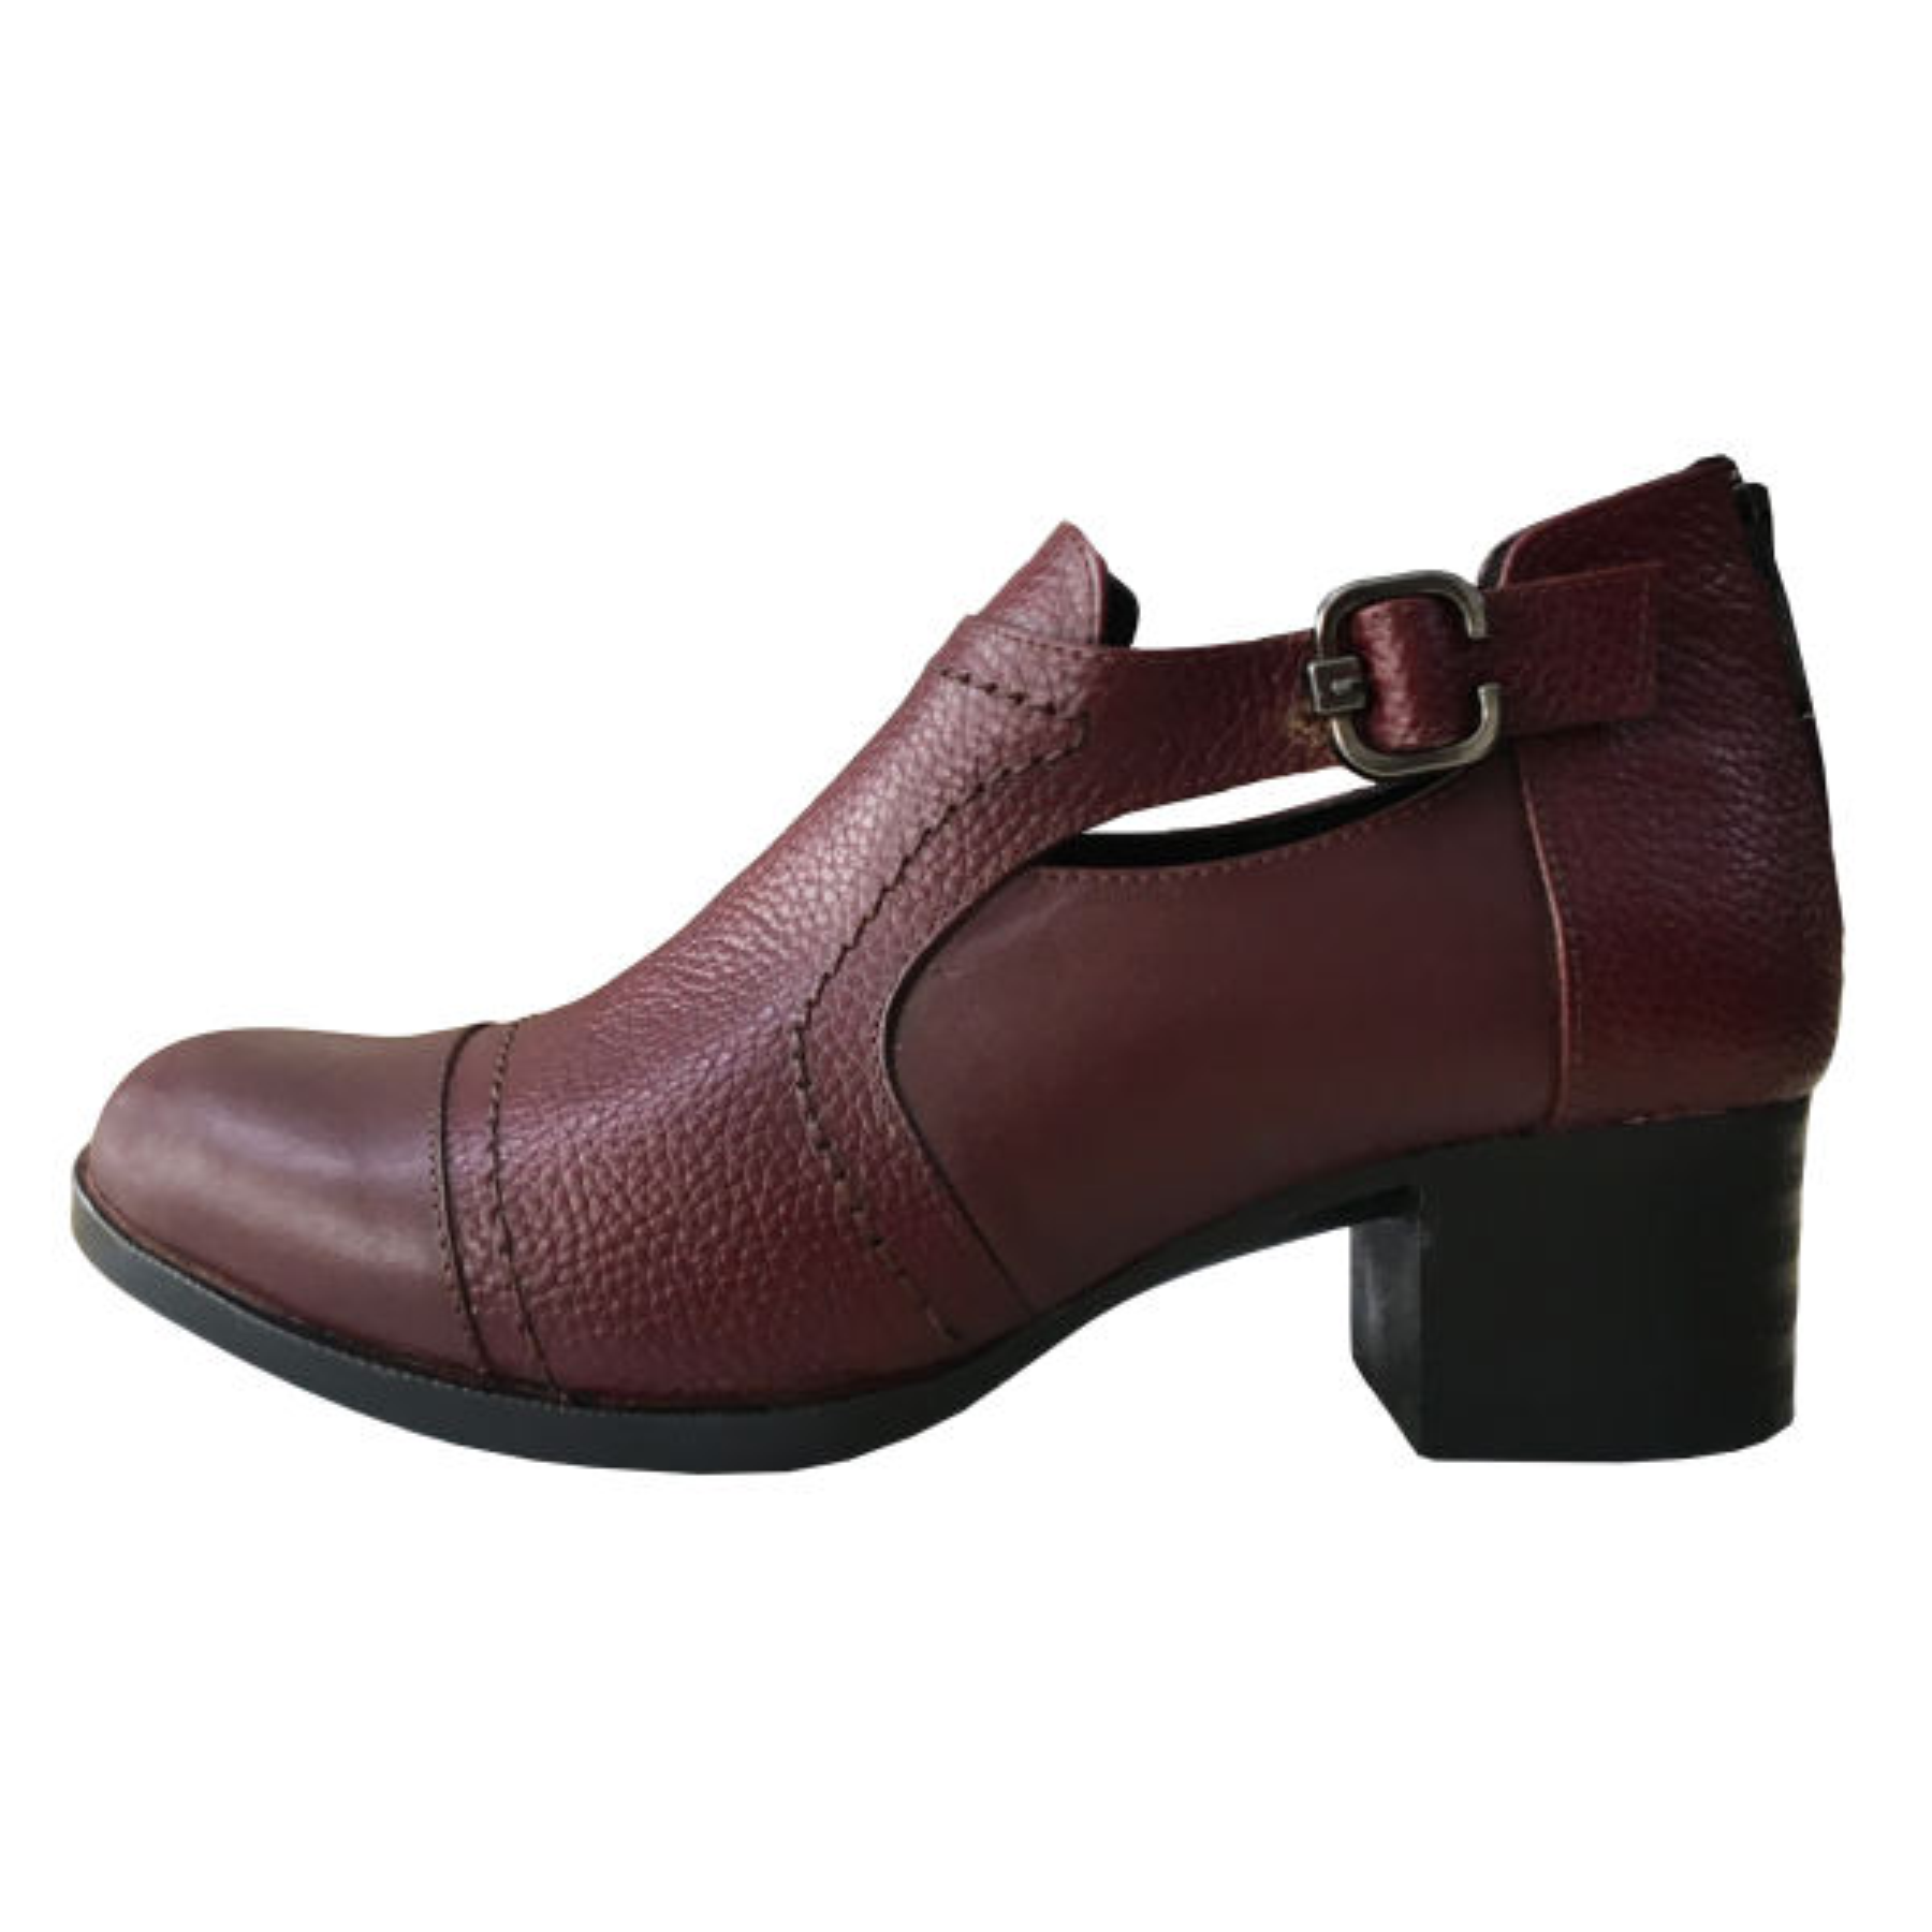 کفش زنانه کد 207